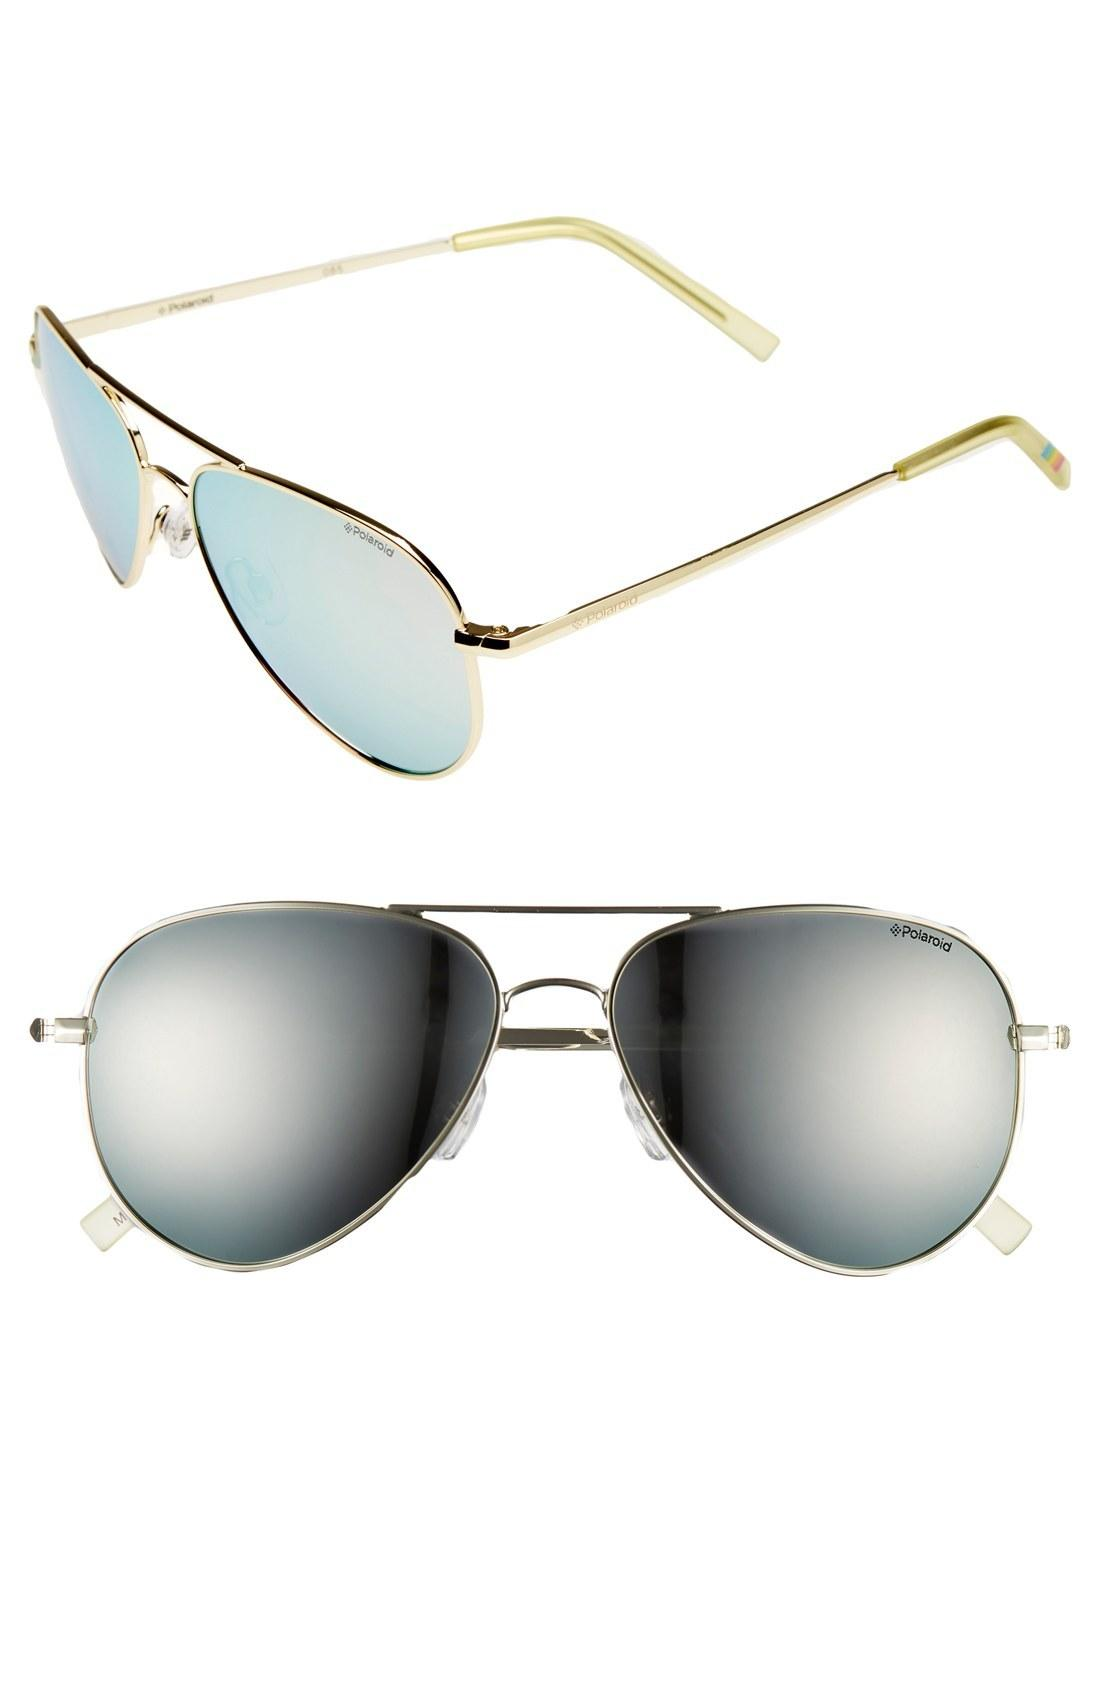 43da00dc1c 56Mm Polarized Aviator Sunglasses - Gold/ Silver Mirror/ Polarized